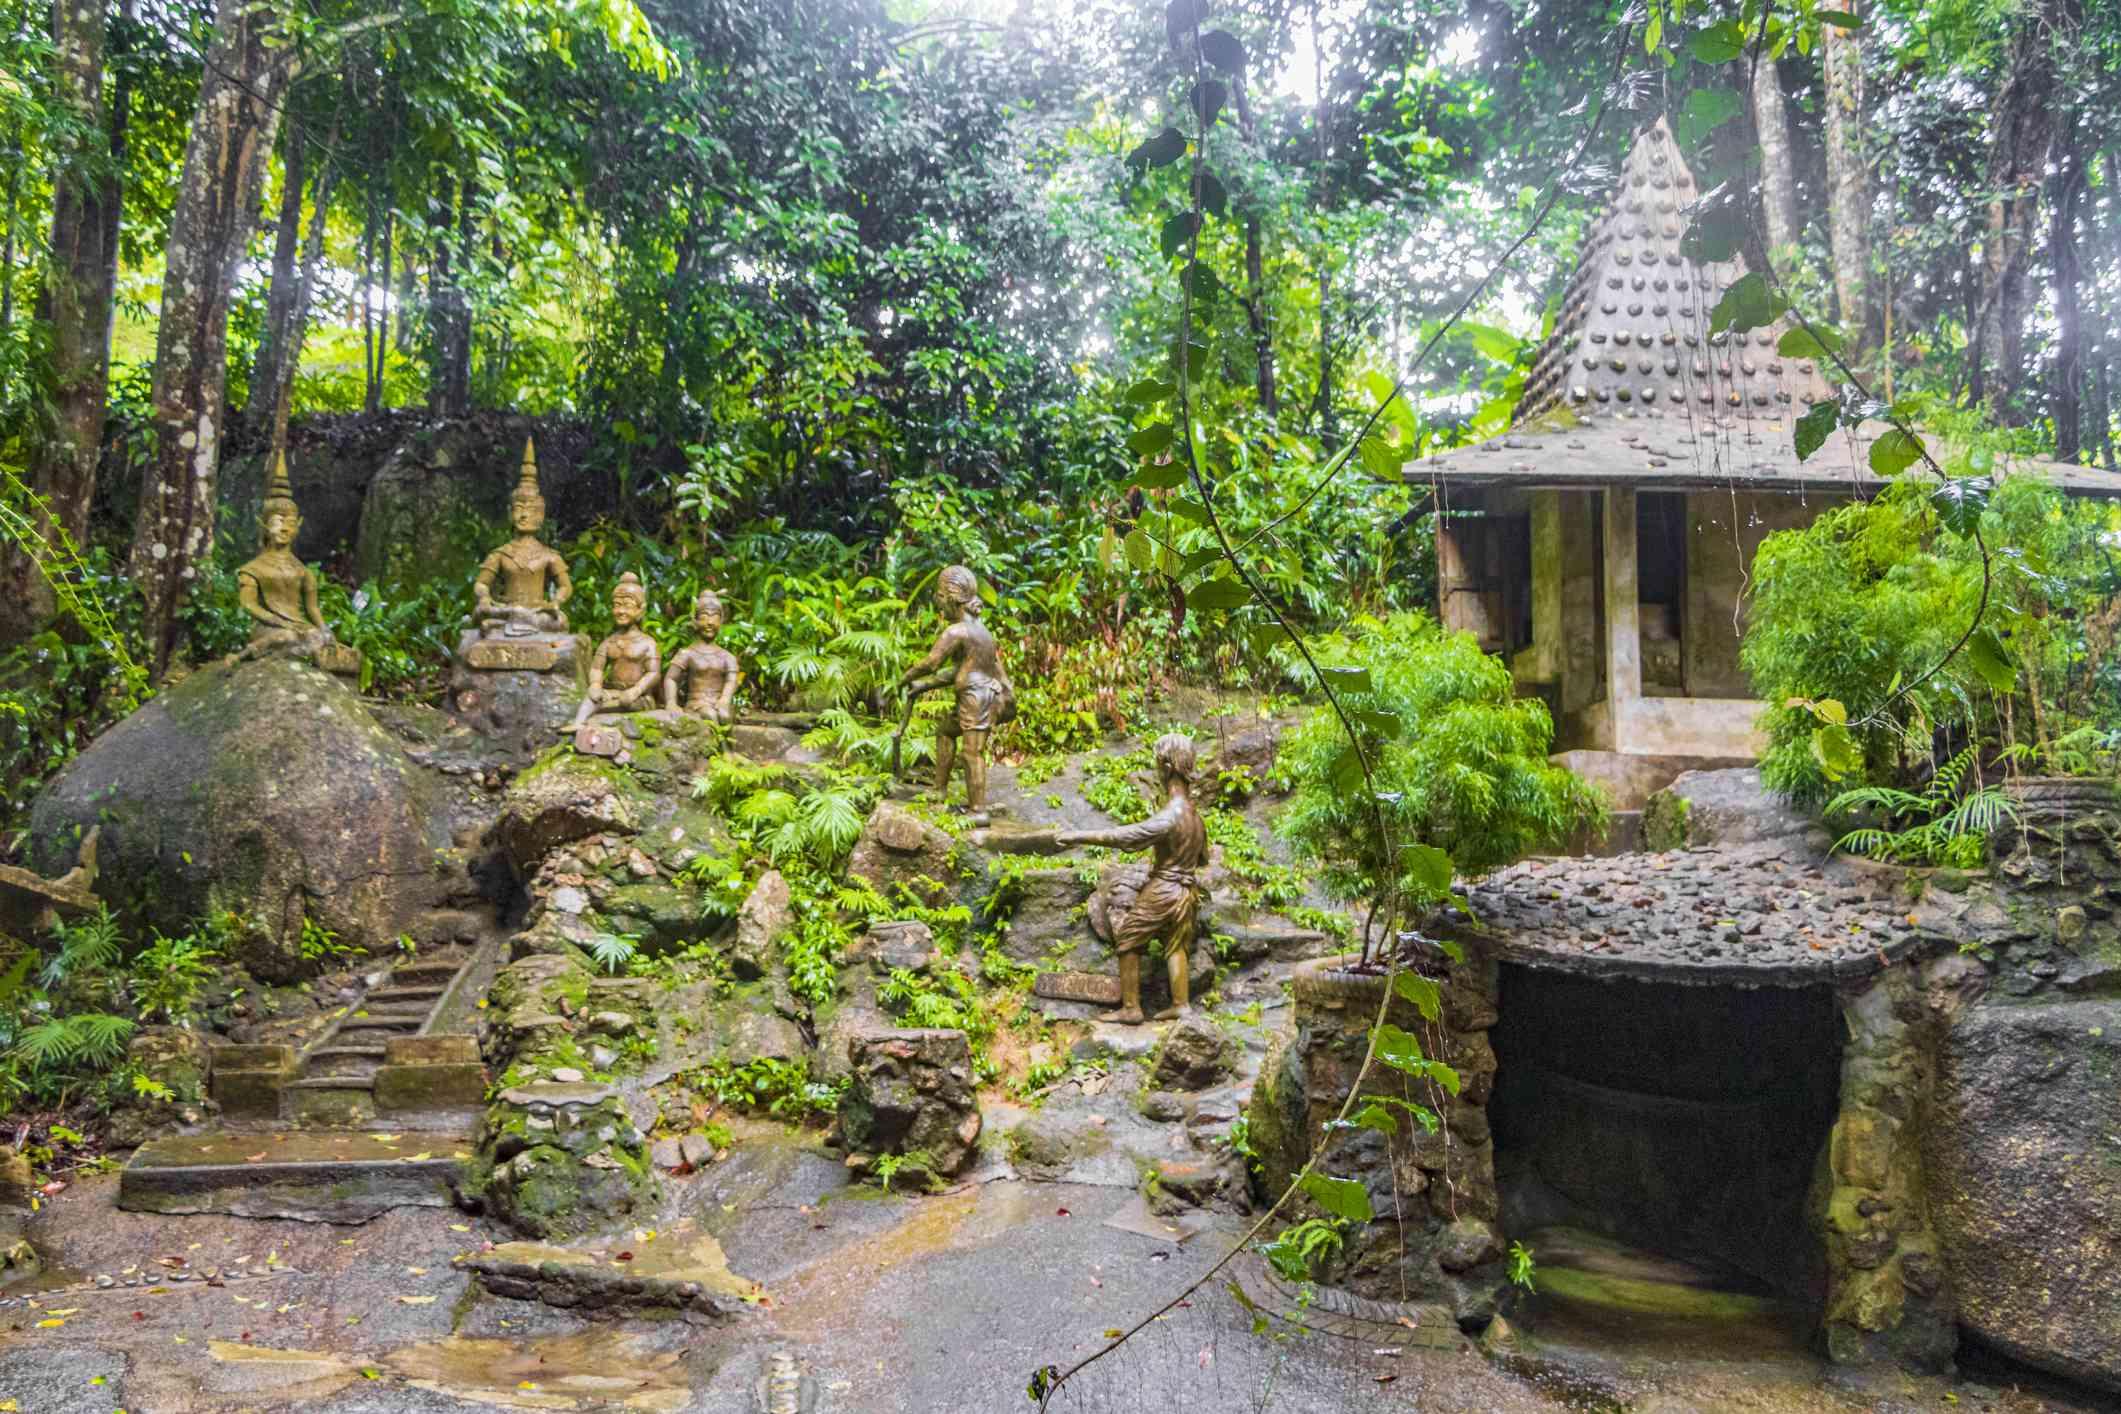 Buddha statues and waterfall at Tarnim Magic Garden, Thailand